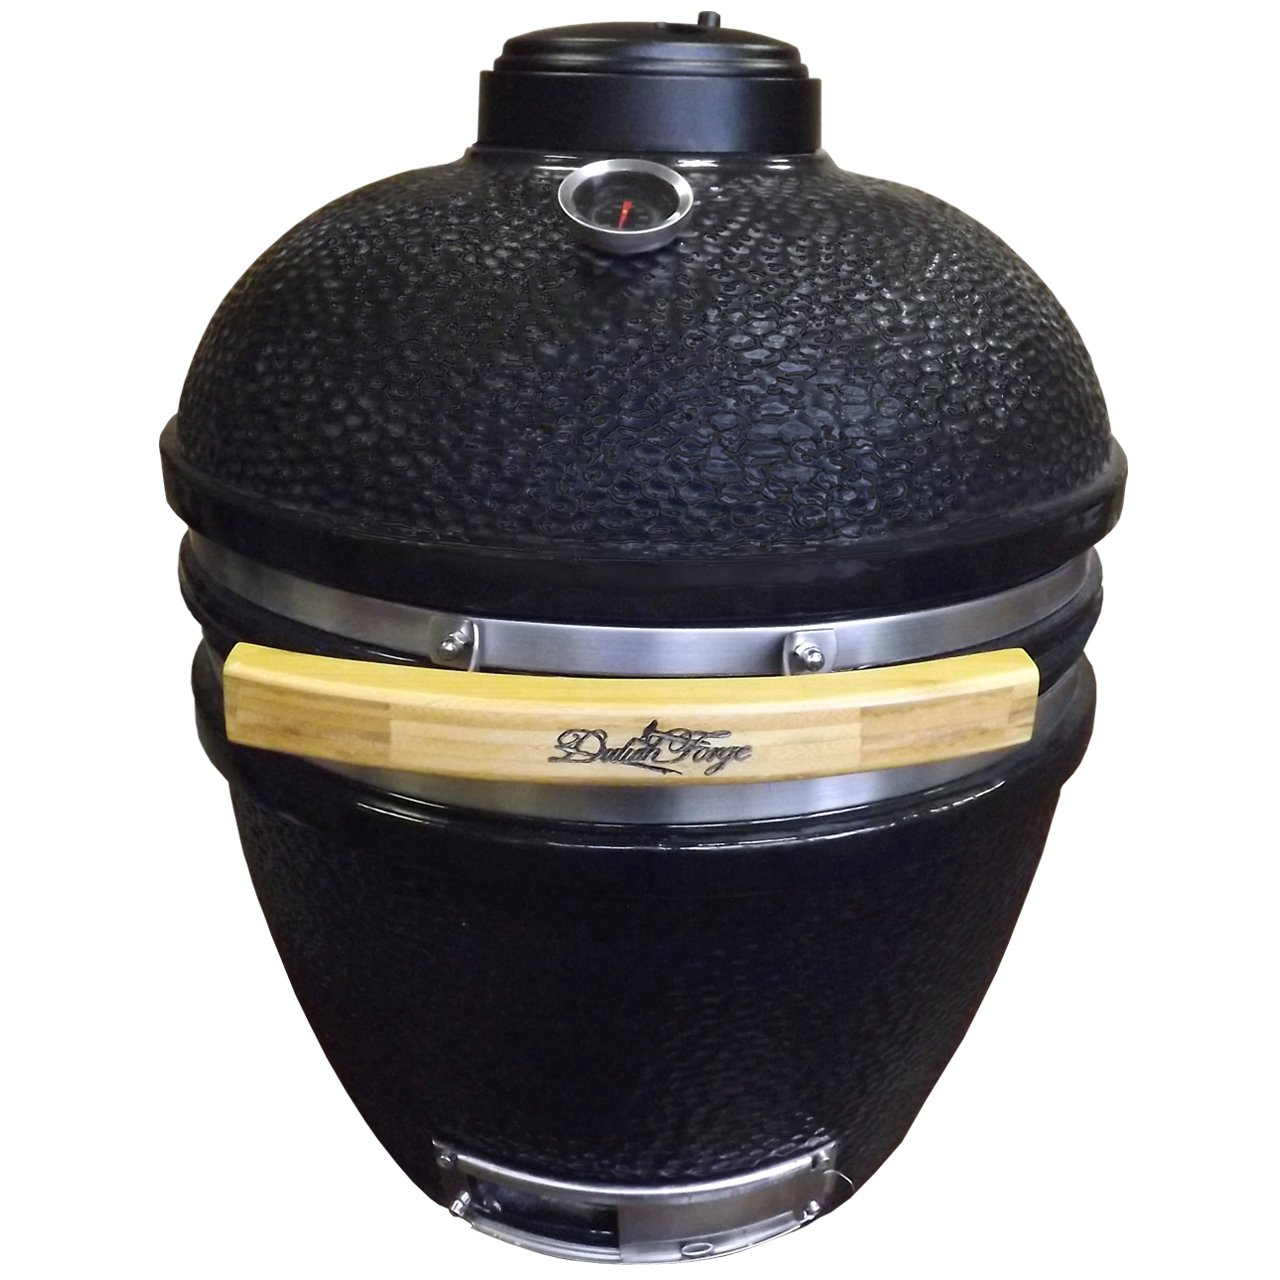 Amazon.com: Dulux Forge kamado – Huevo parrilla, ahumador ...